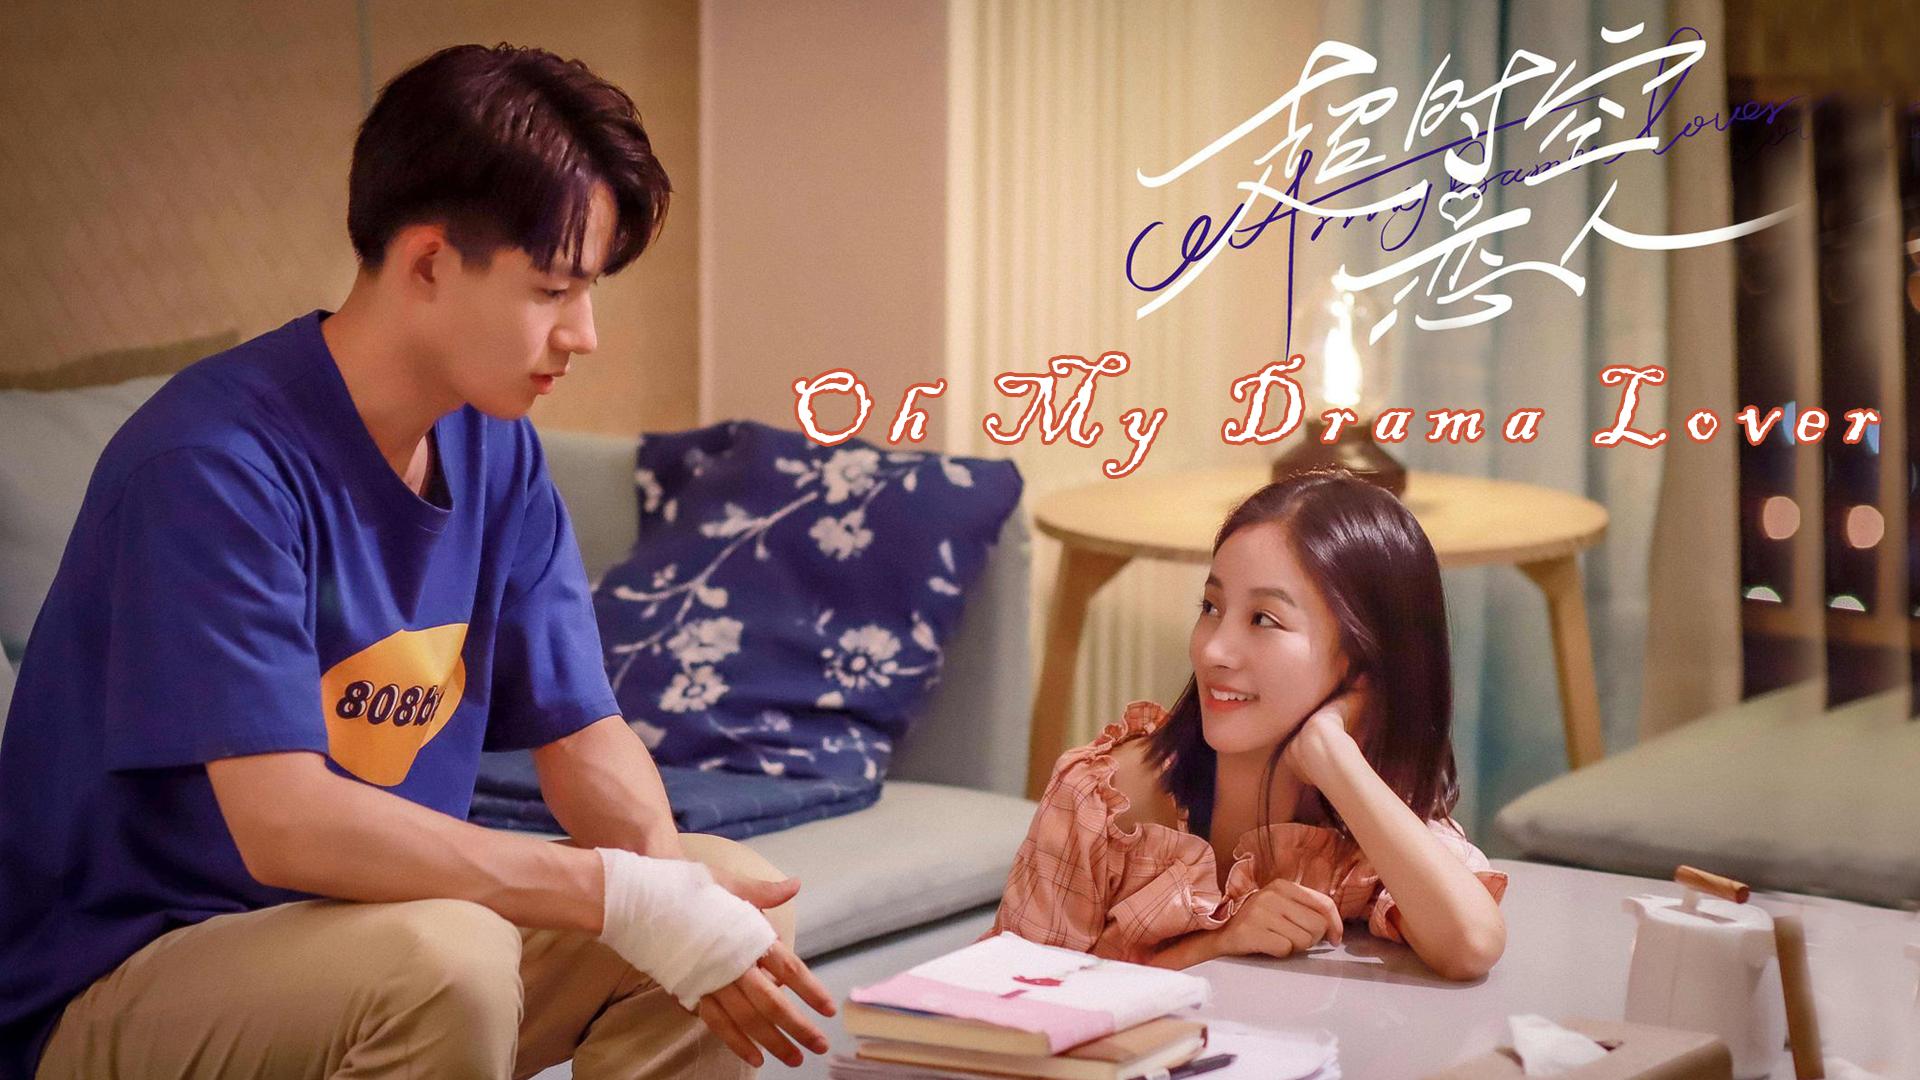 Oh My Drama Lover - Season 1